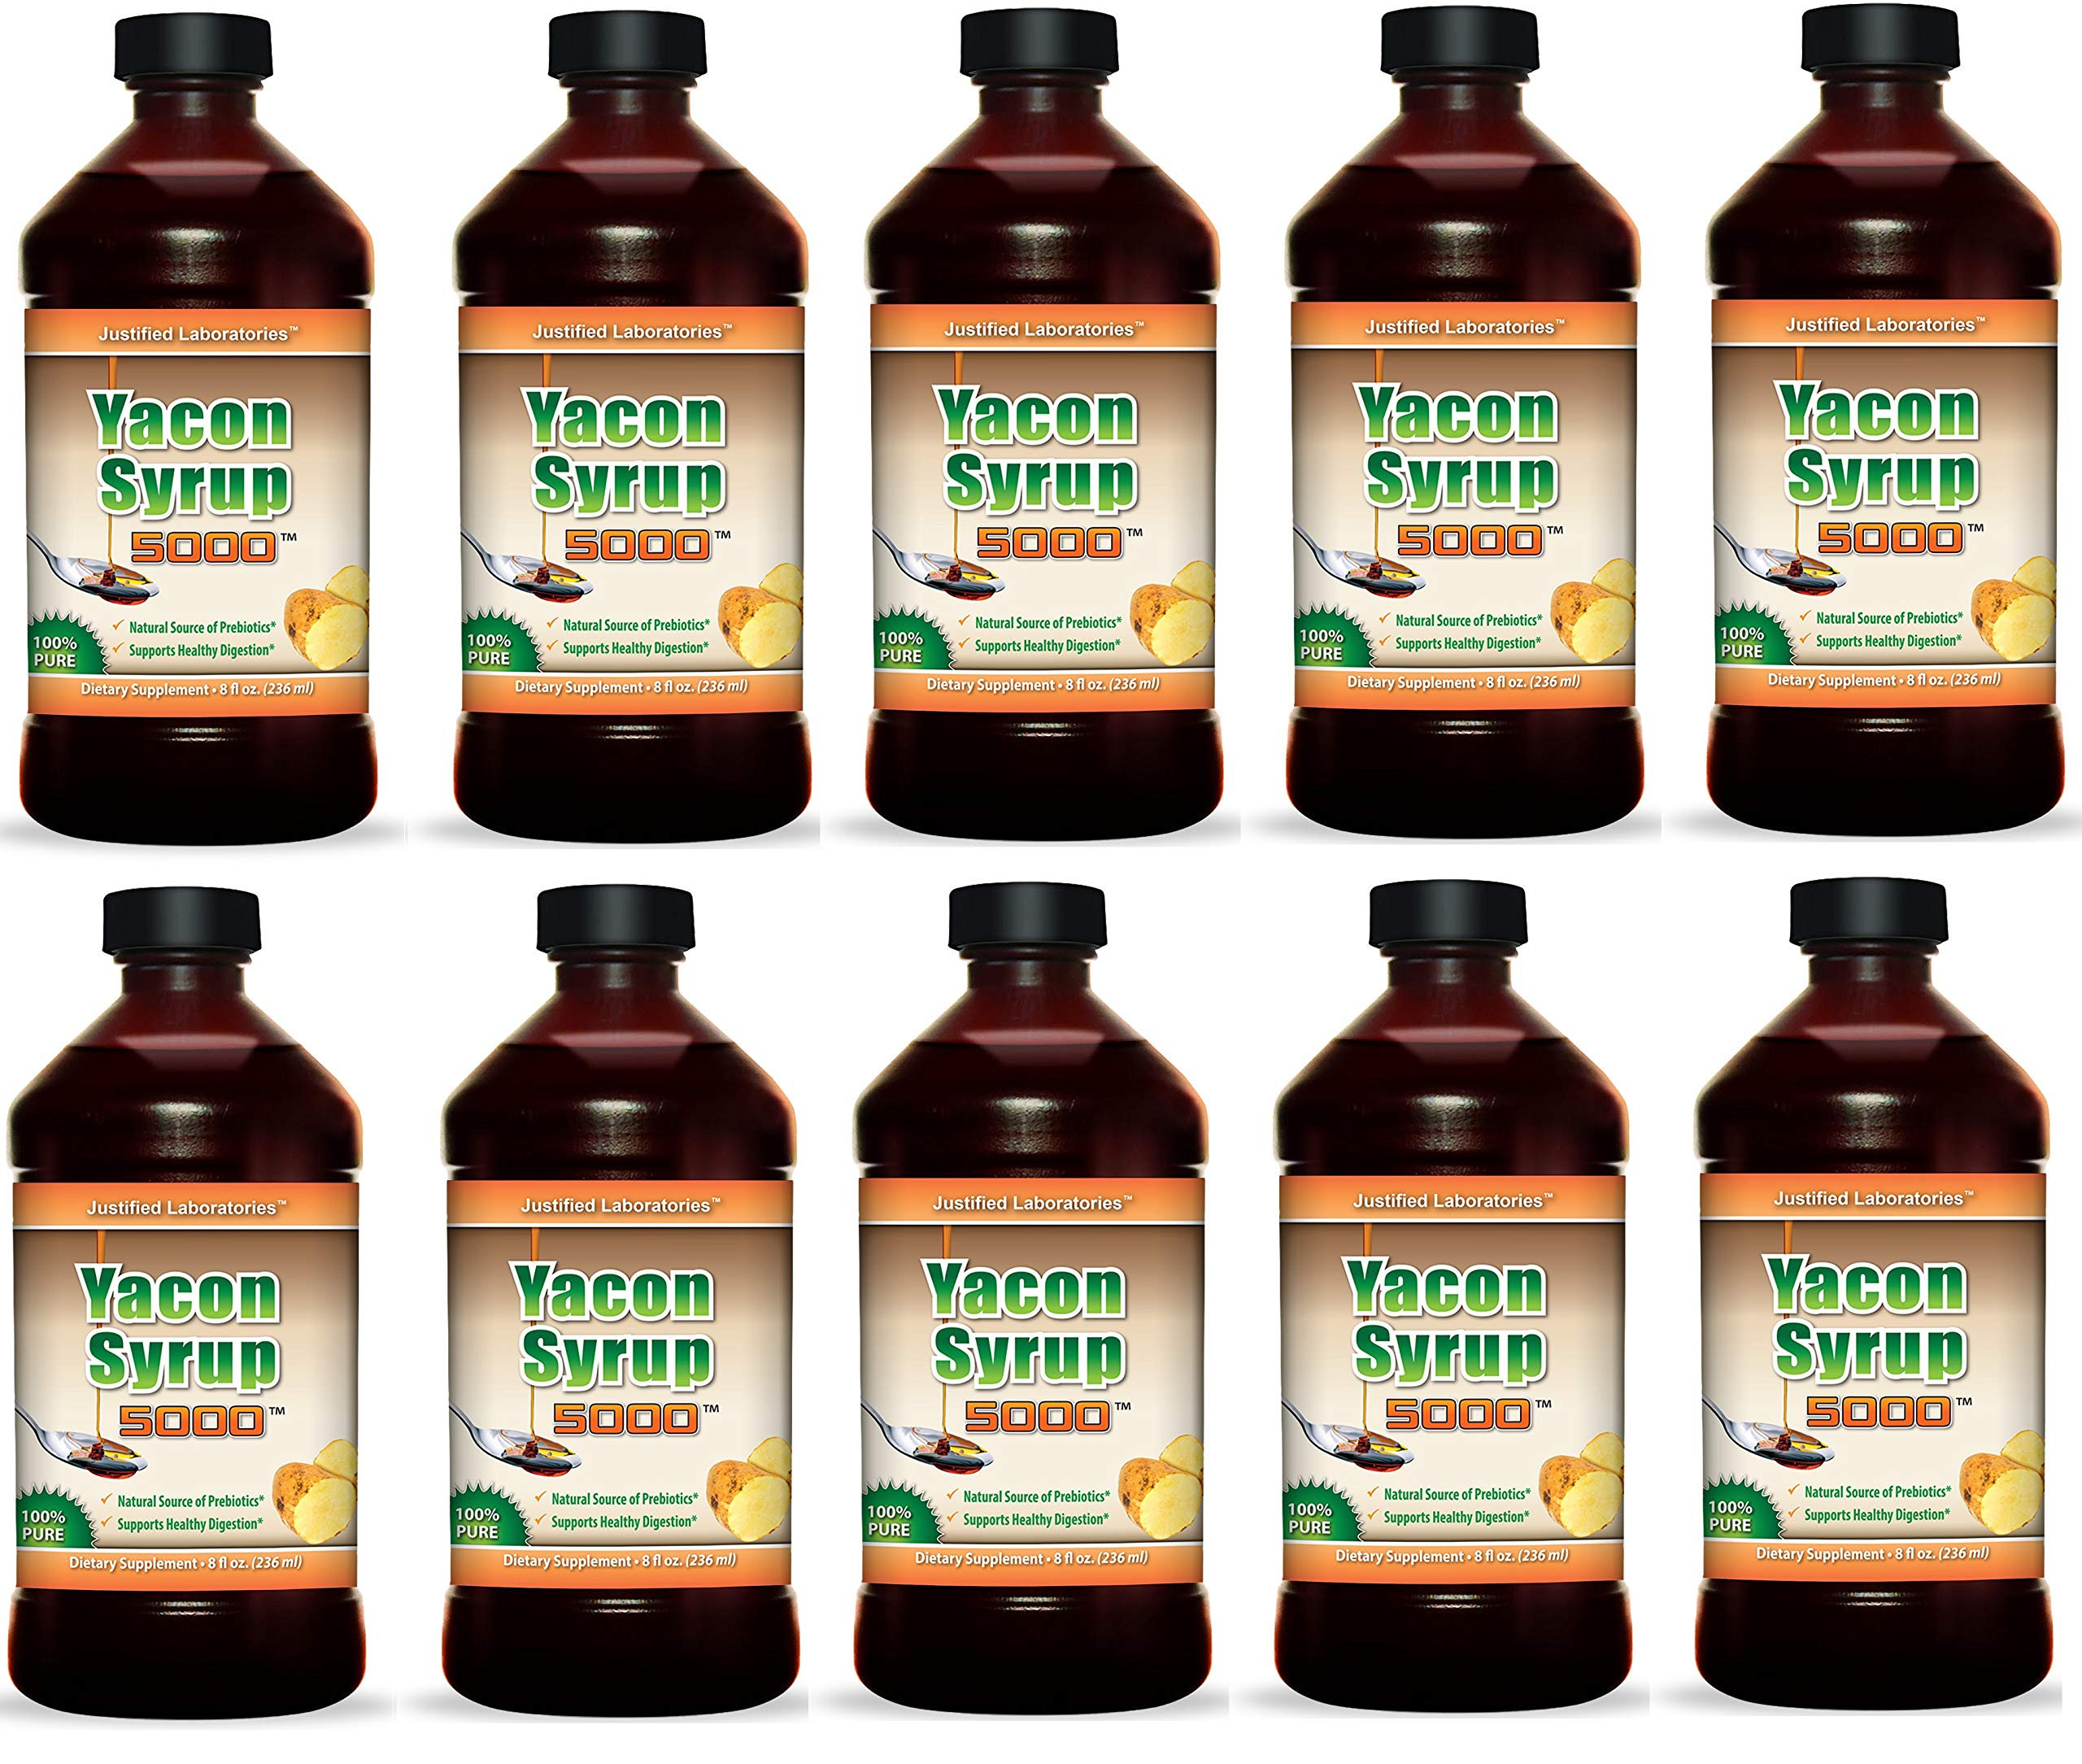 Yacon Syrup 100% Pure Raw All Natural Low Cal Natural Sweetener 8 oz 10 Bottles